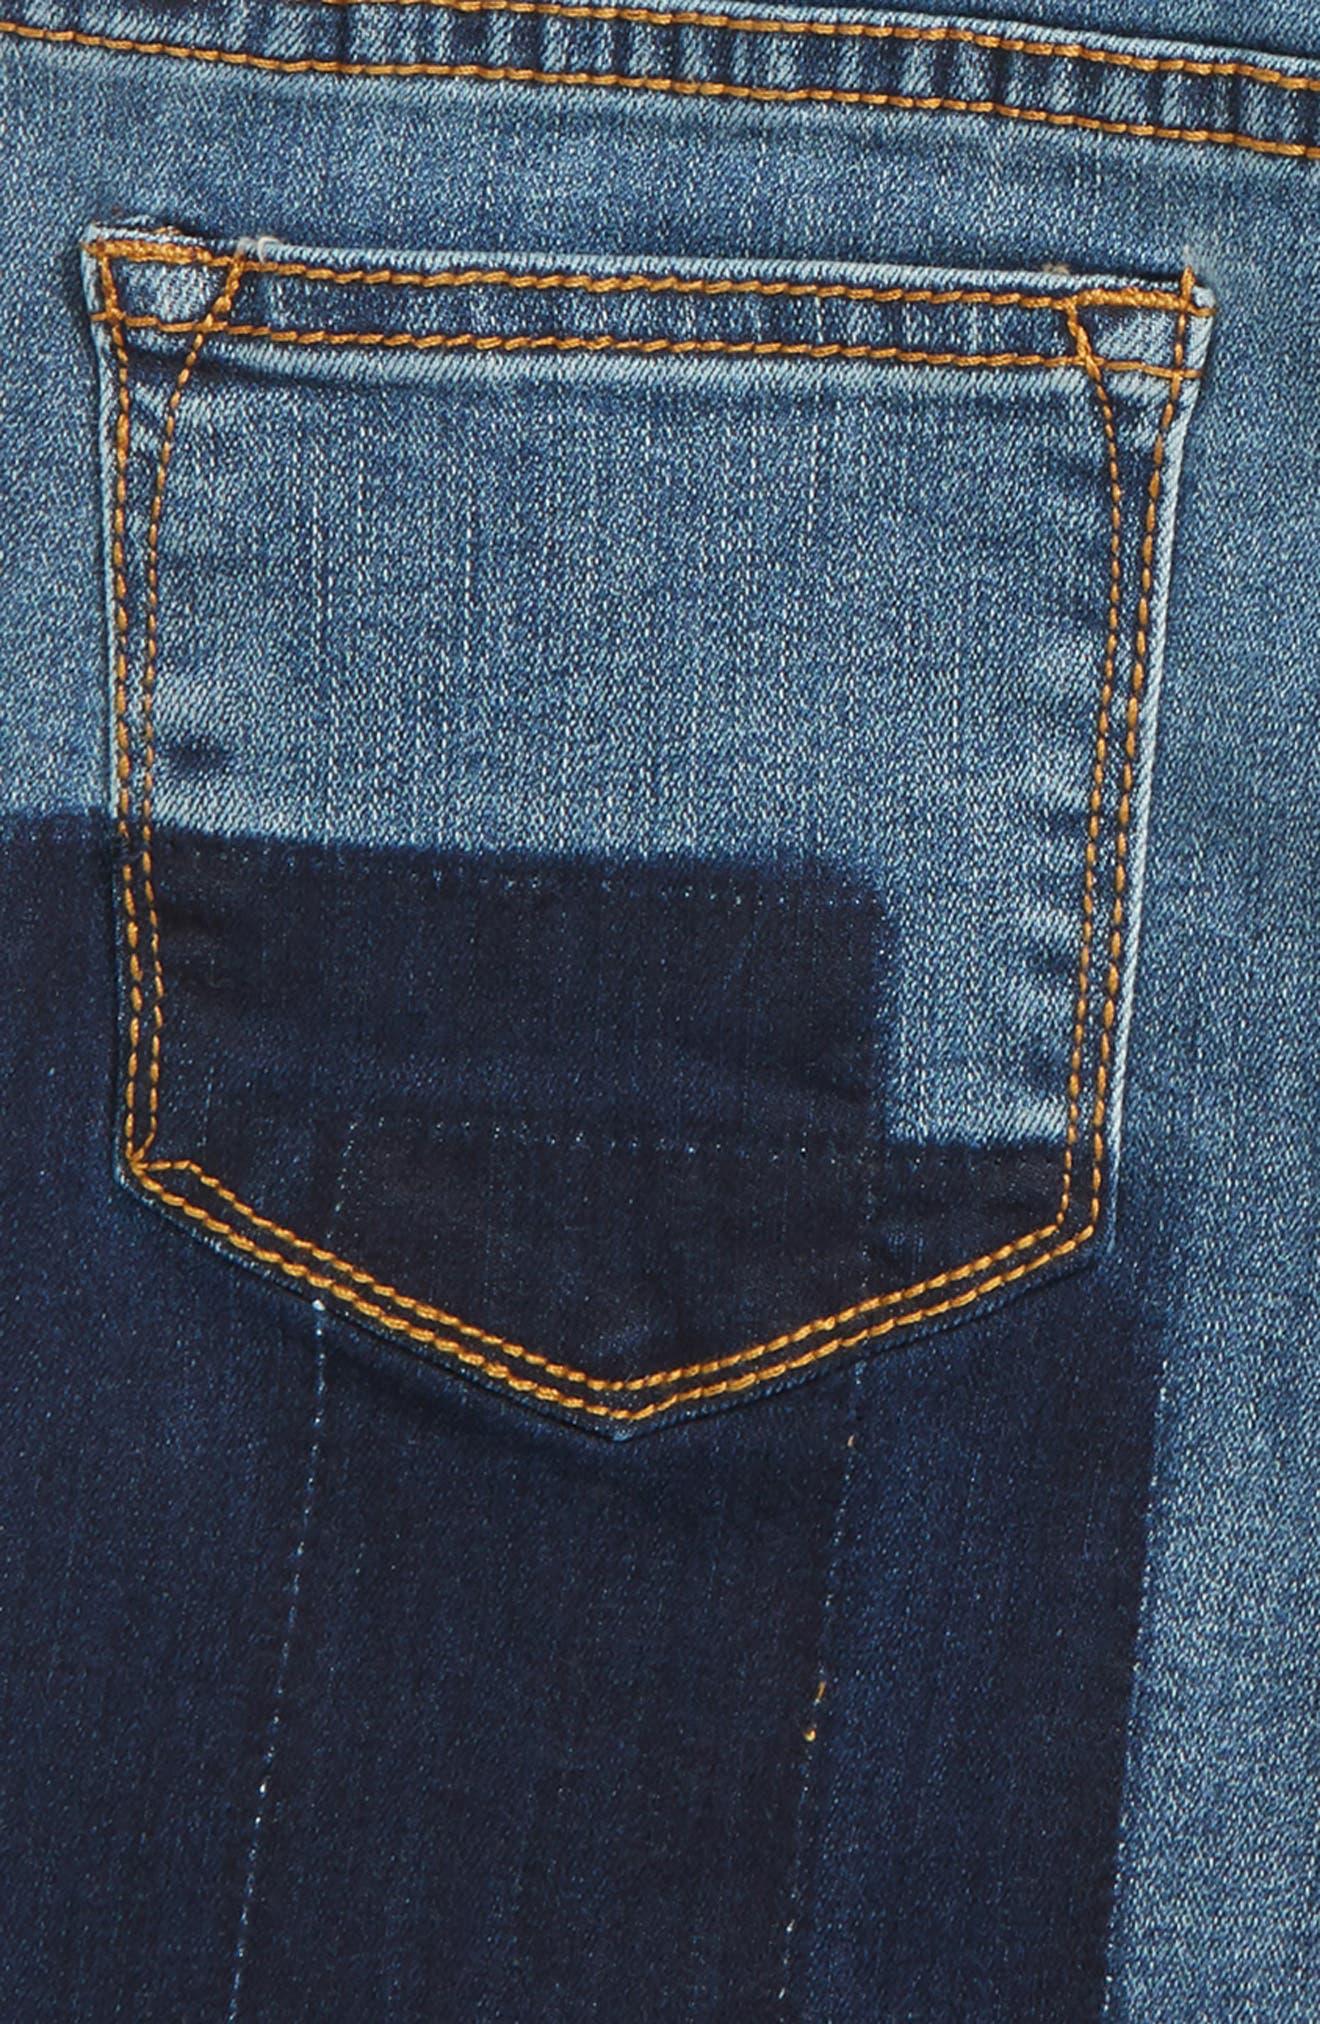 Shadow Frayed Cutoff Denim Shorts,                             Alternate thumbnail 3, color,                             426